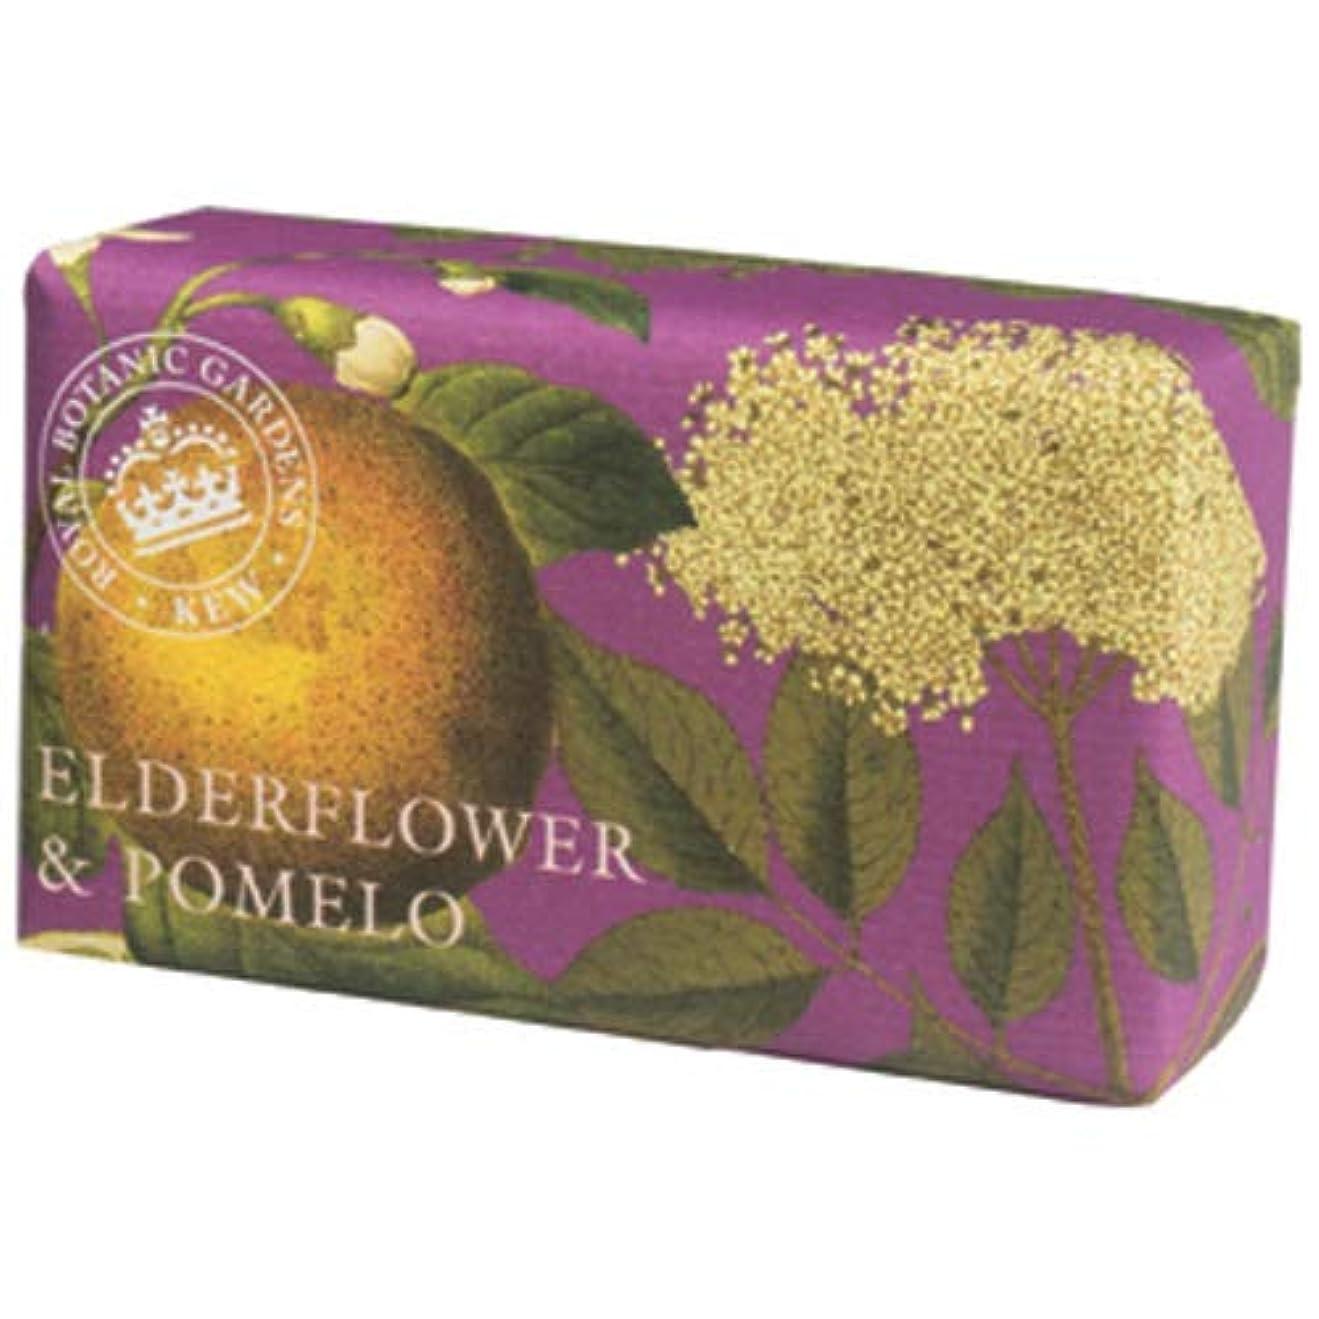 English Soap Company イングリッシュソープカンパニー KEW GARDEN キュー?ガーデン Luxury Shea Soaps シアソープ Elderflower & Pomelo エルダーフラワー...